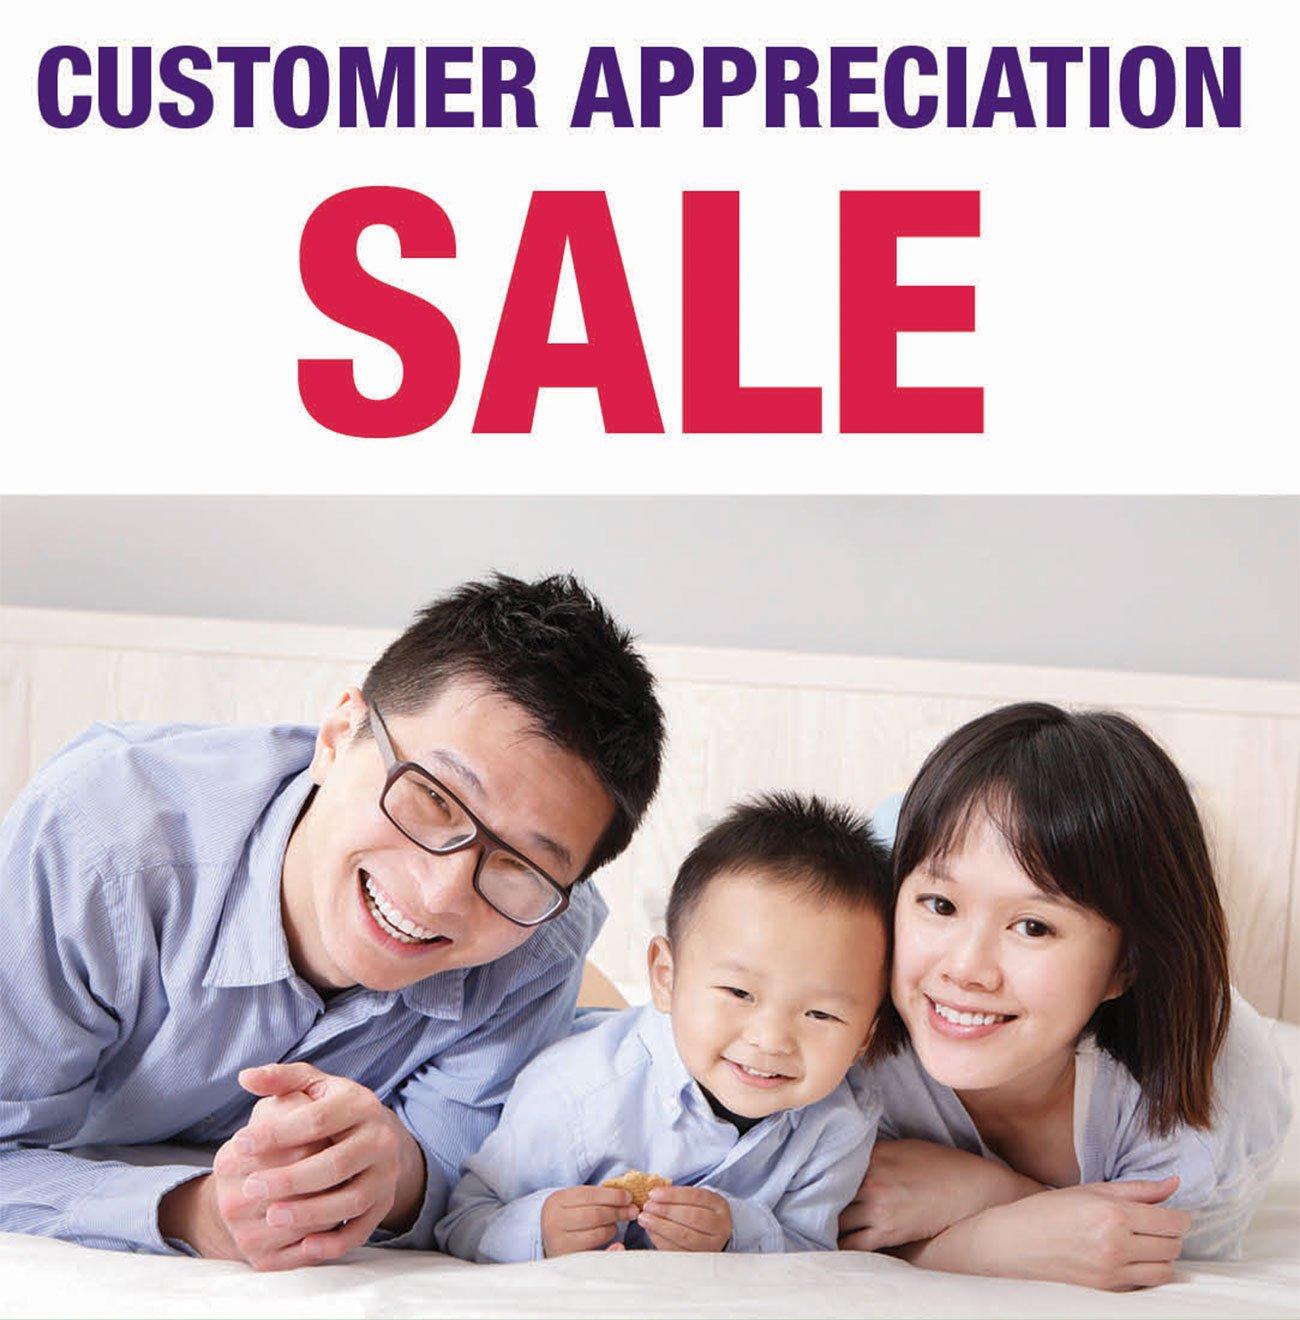 Customer-Appreciation-Sale-Family-On-Bed-Header